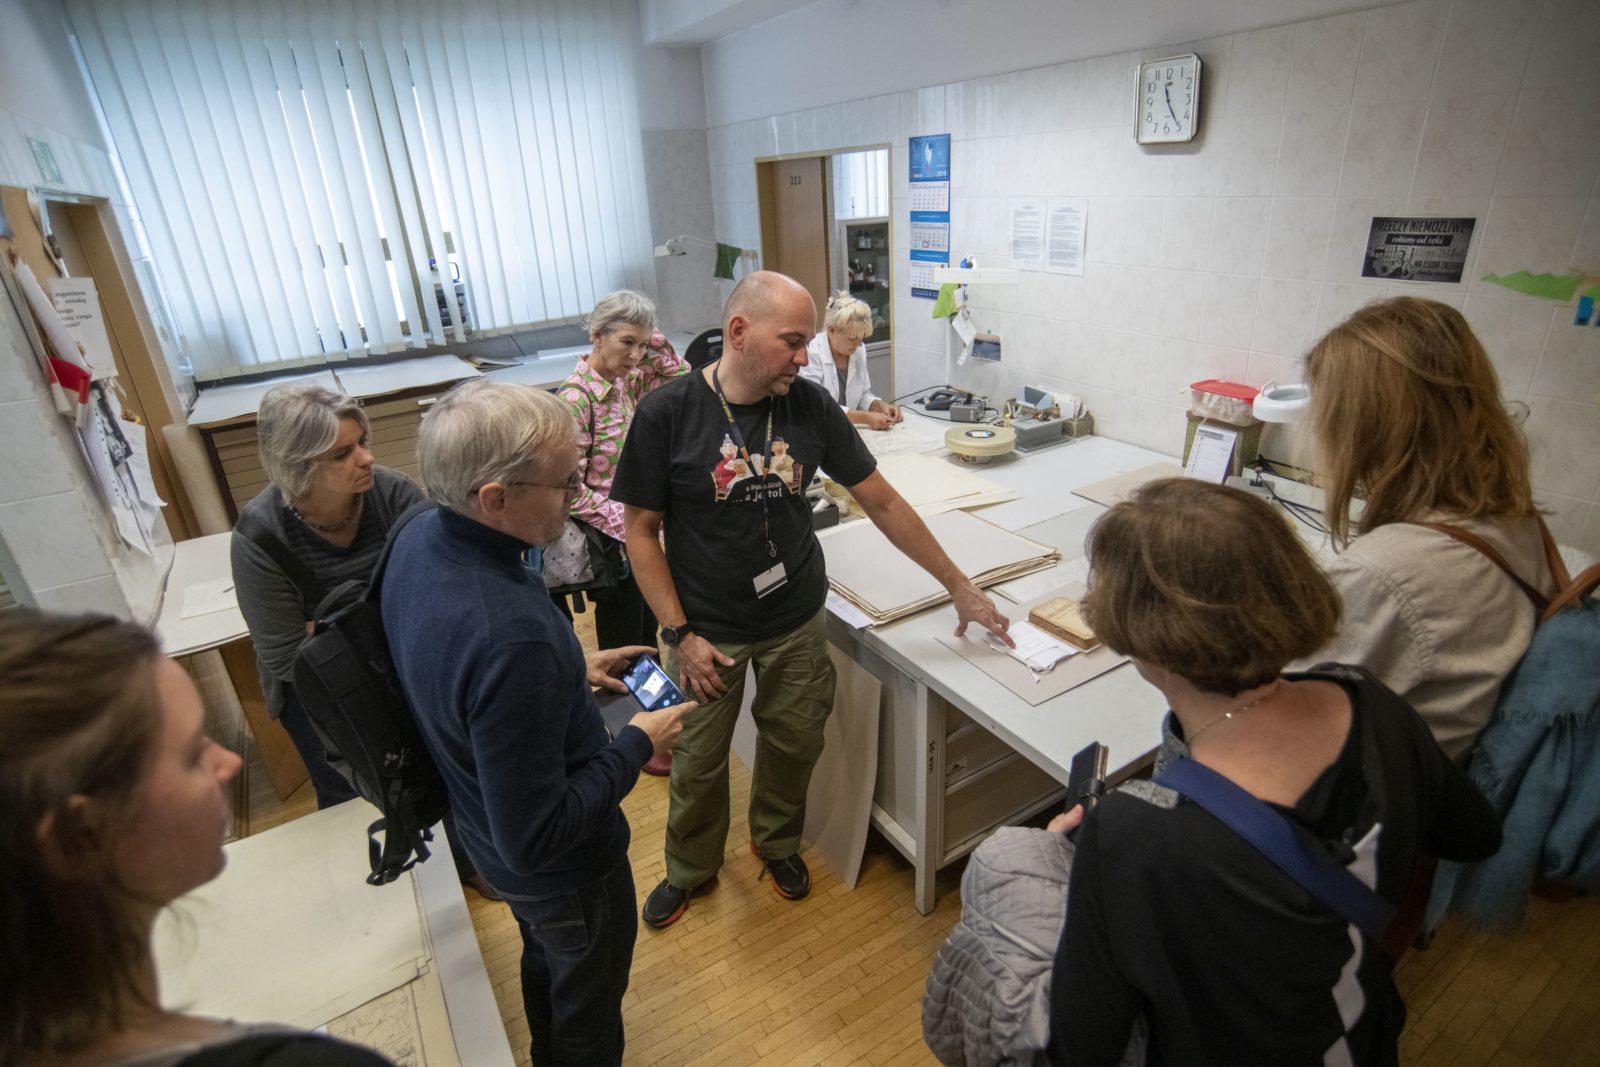 Warschau_2019_Tour_Library_of_Poland_Warsaw_Stasiuk_Konrad_183